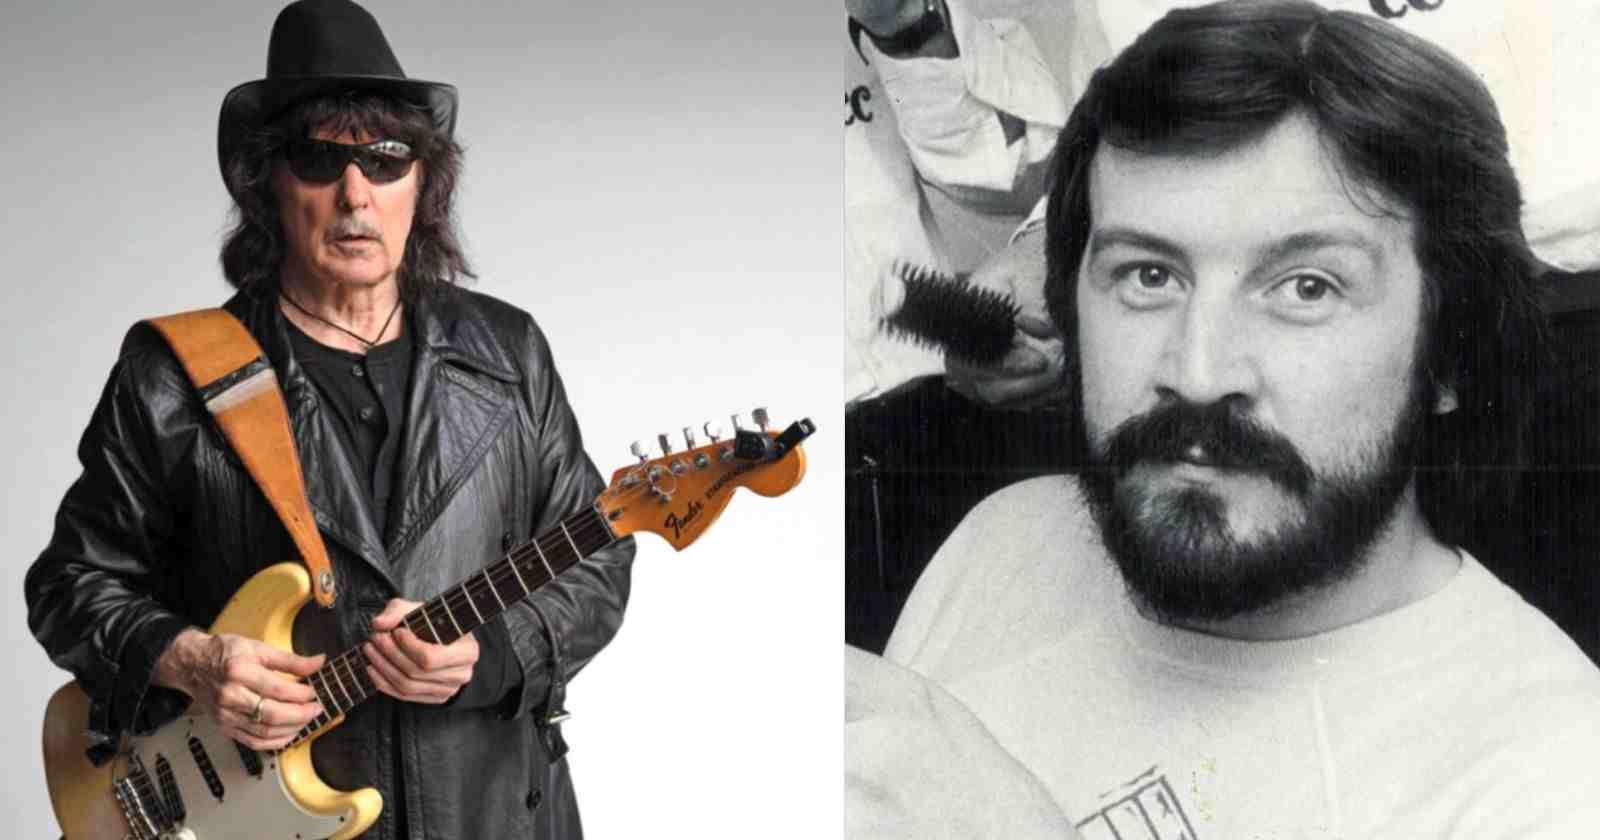 Ritchie Blackmore John Bonham